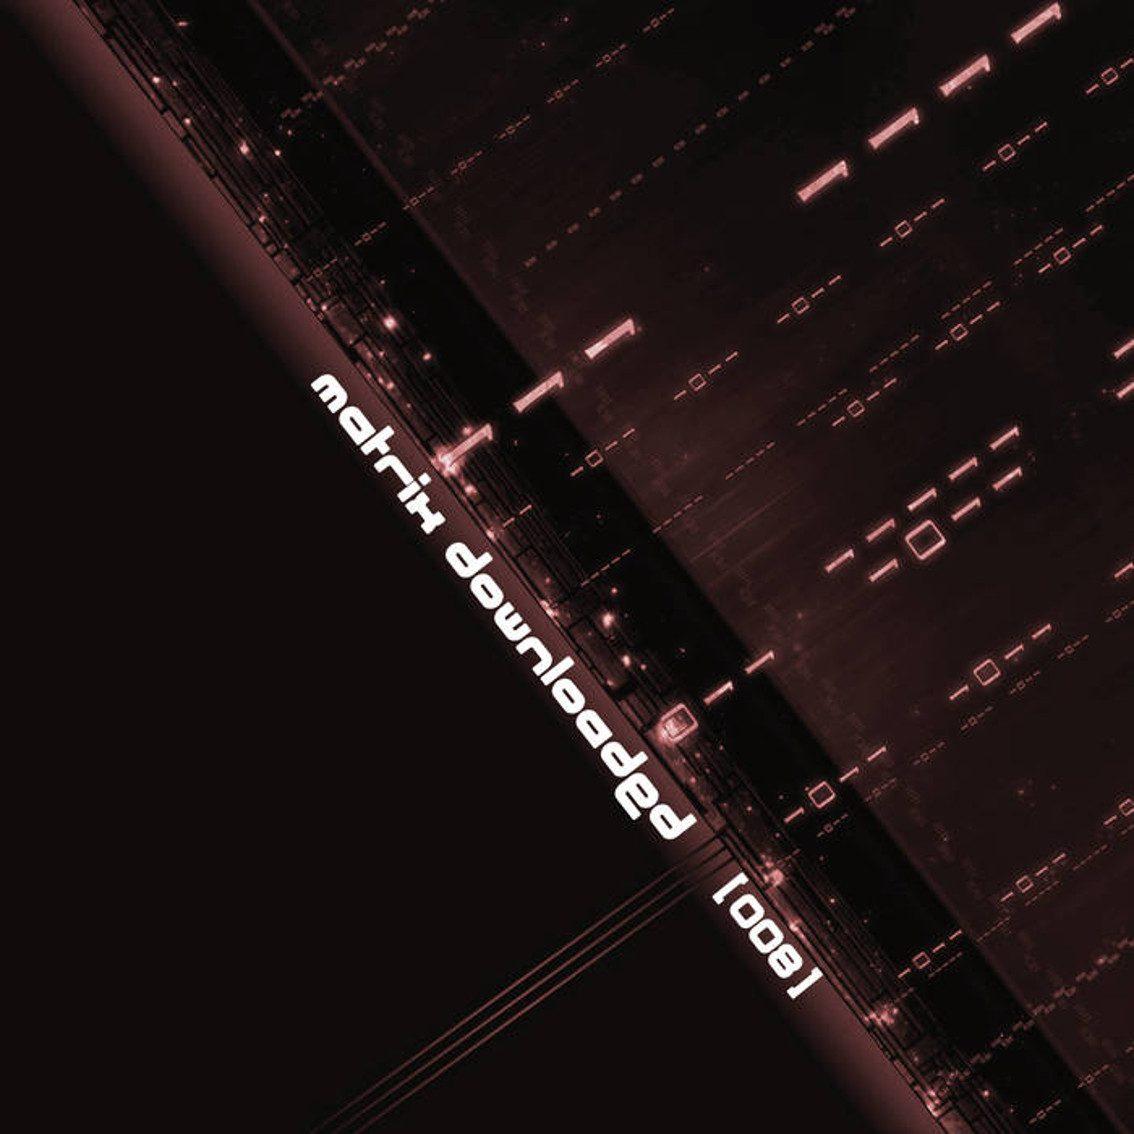 Alfa Matrix launches 200 minute-plus compilation for free:'Matrix Downloaded 008'